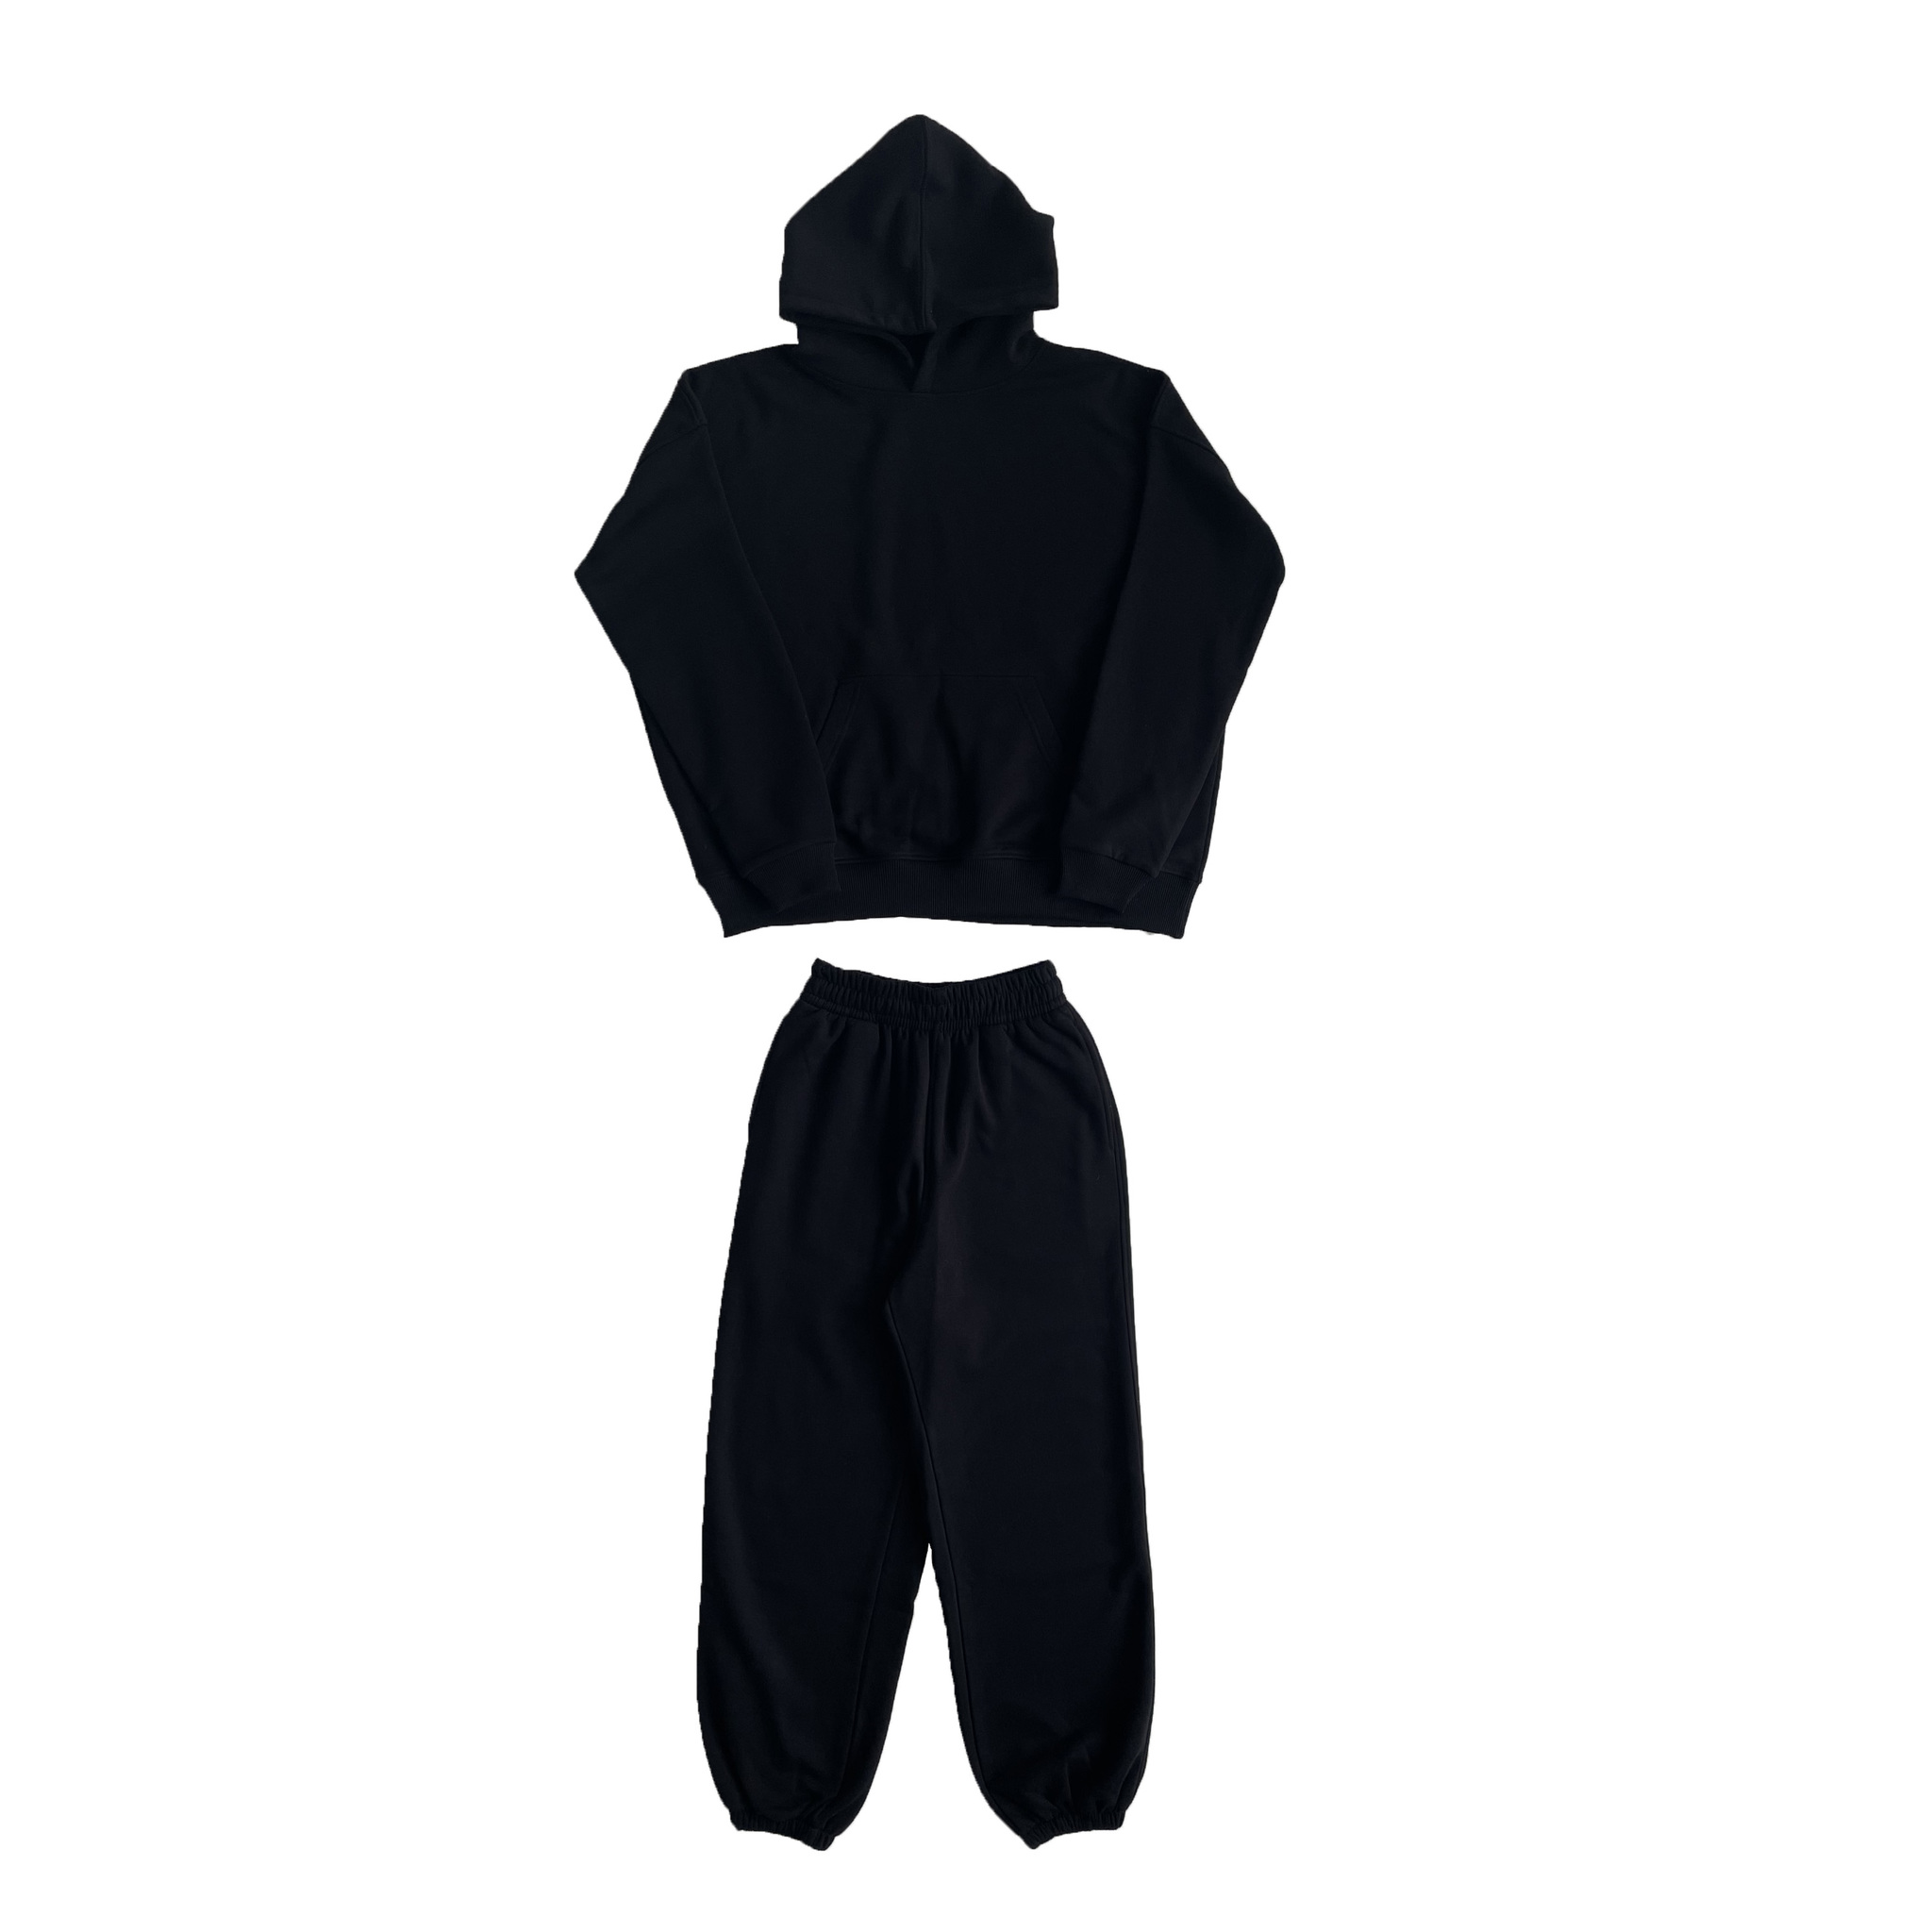 Спортивный костюм оверсайз с начесом 616 Basic